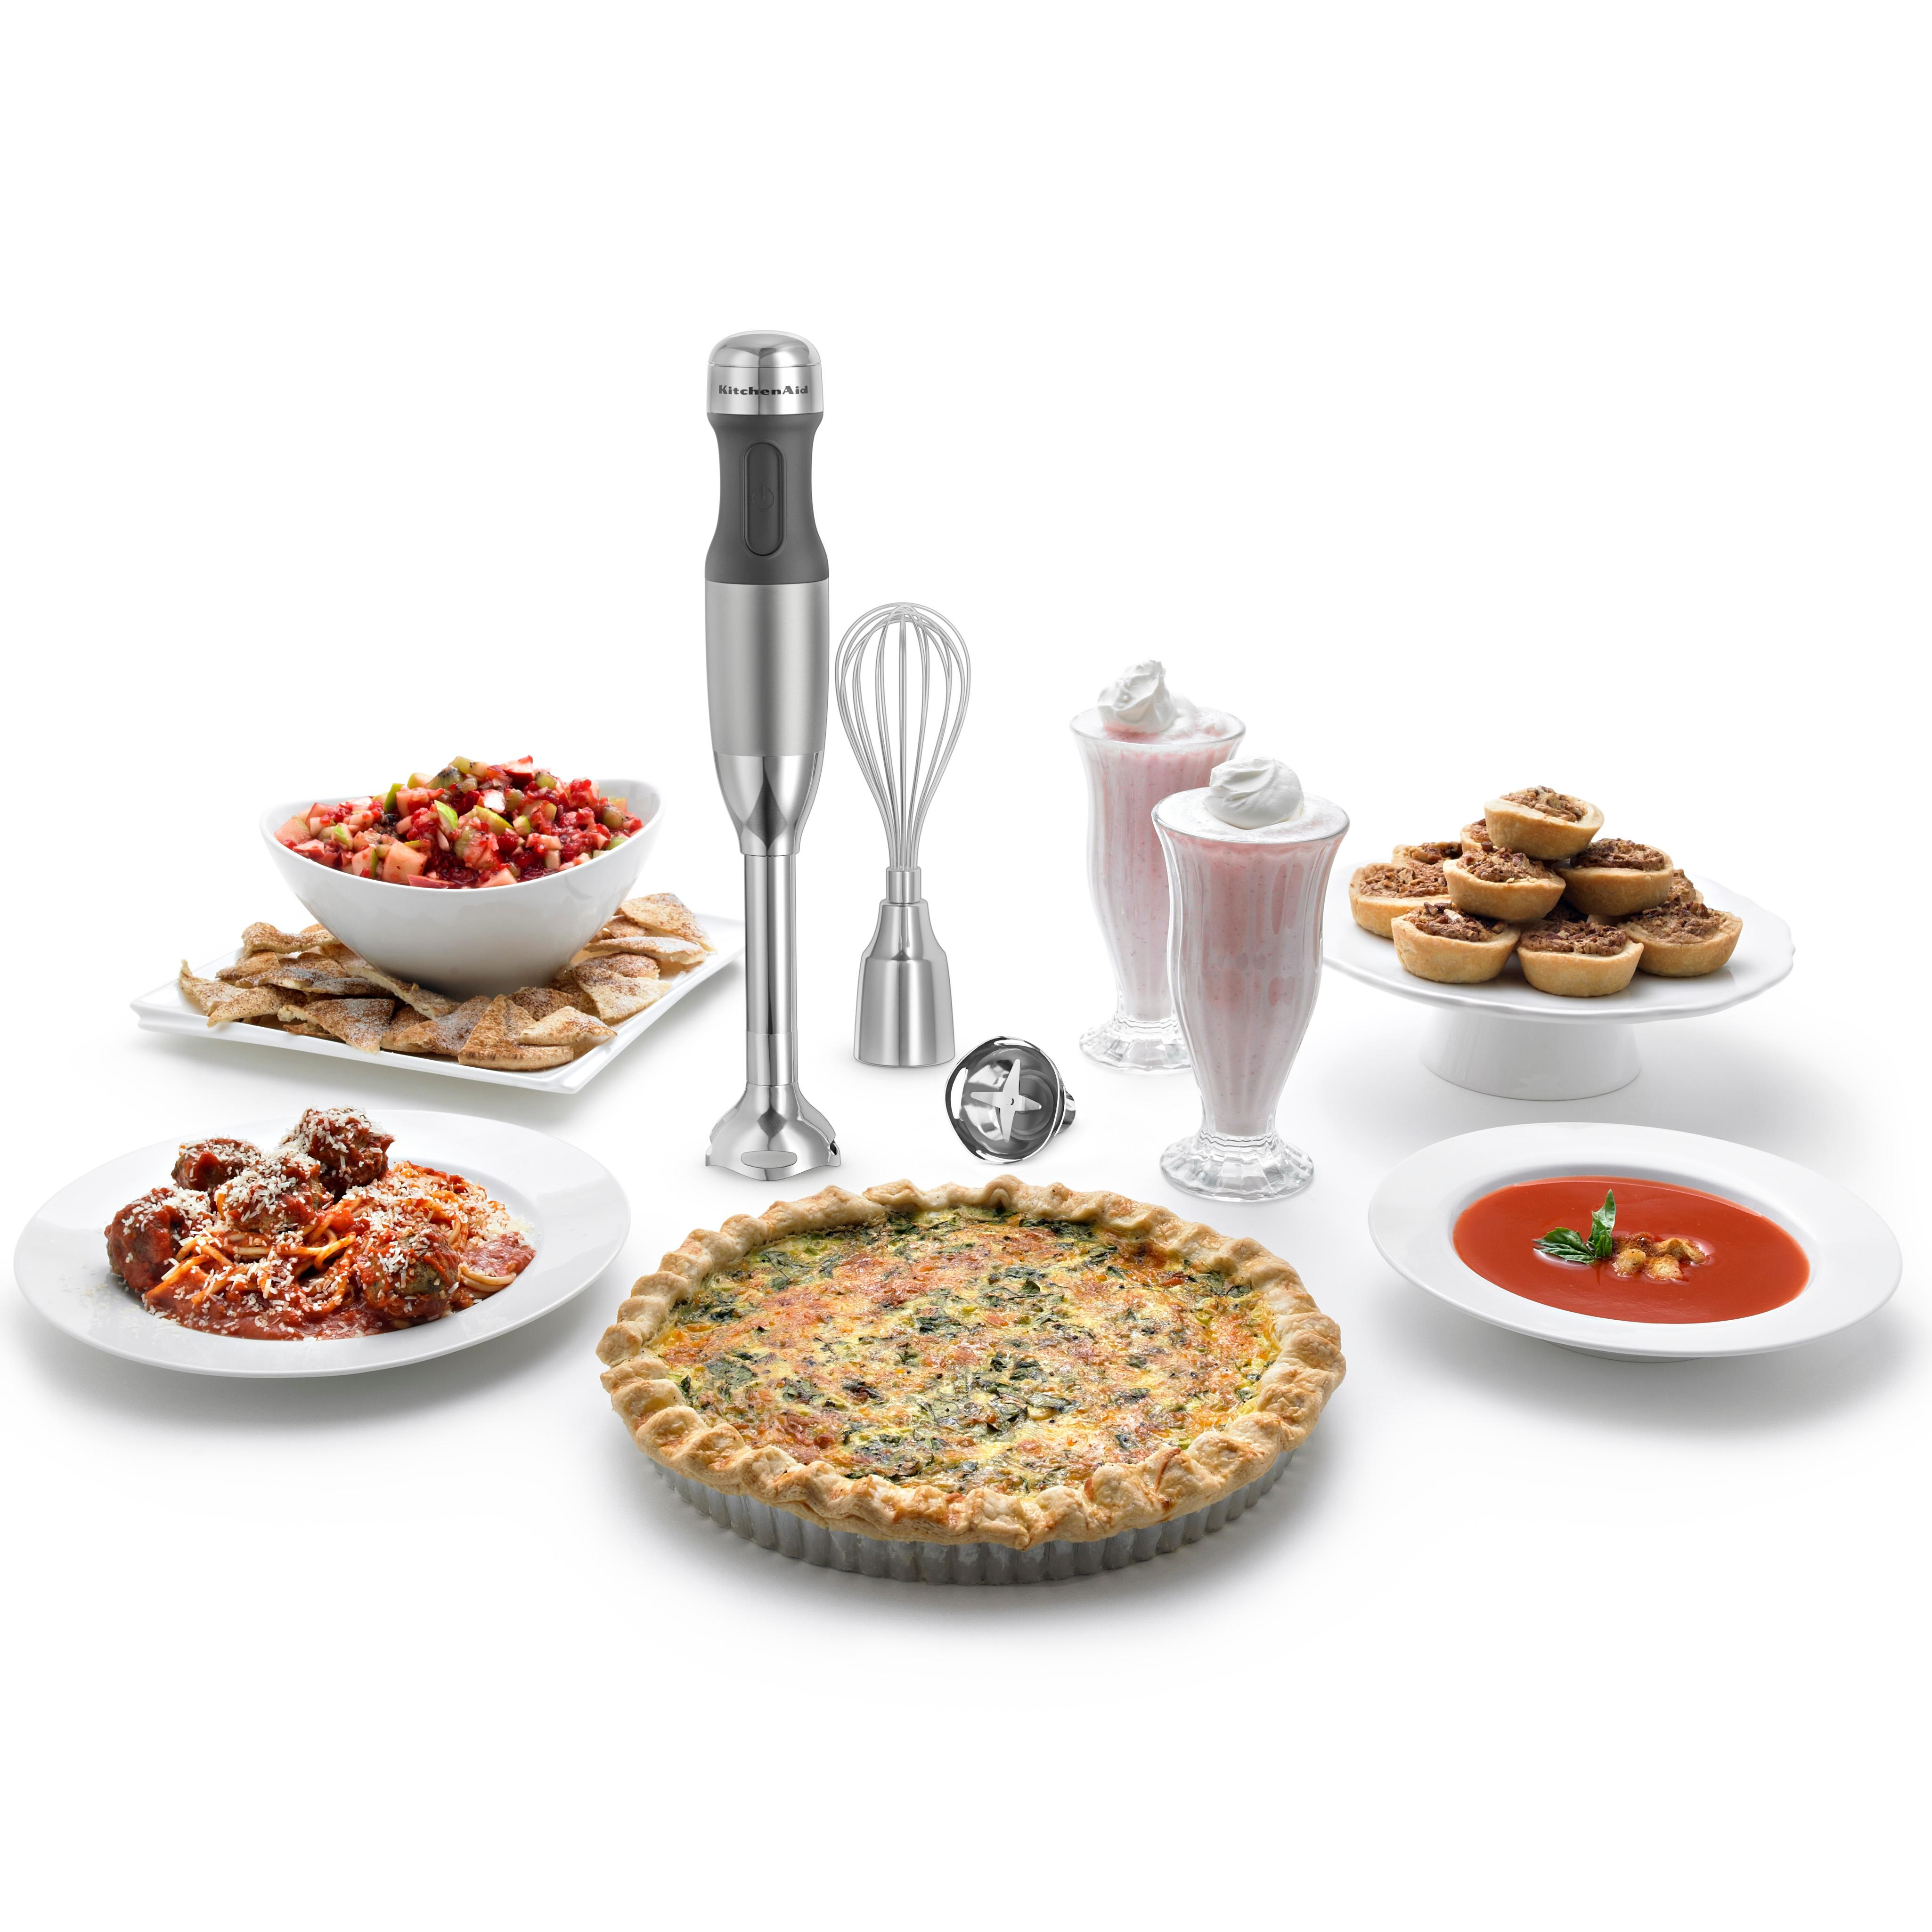 Amazon.com: KitchenAid KHB2352CU 3-Speed Hand Blender - Contour ...